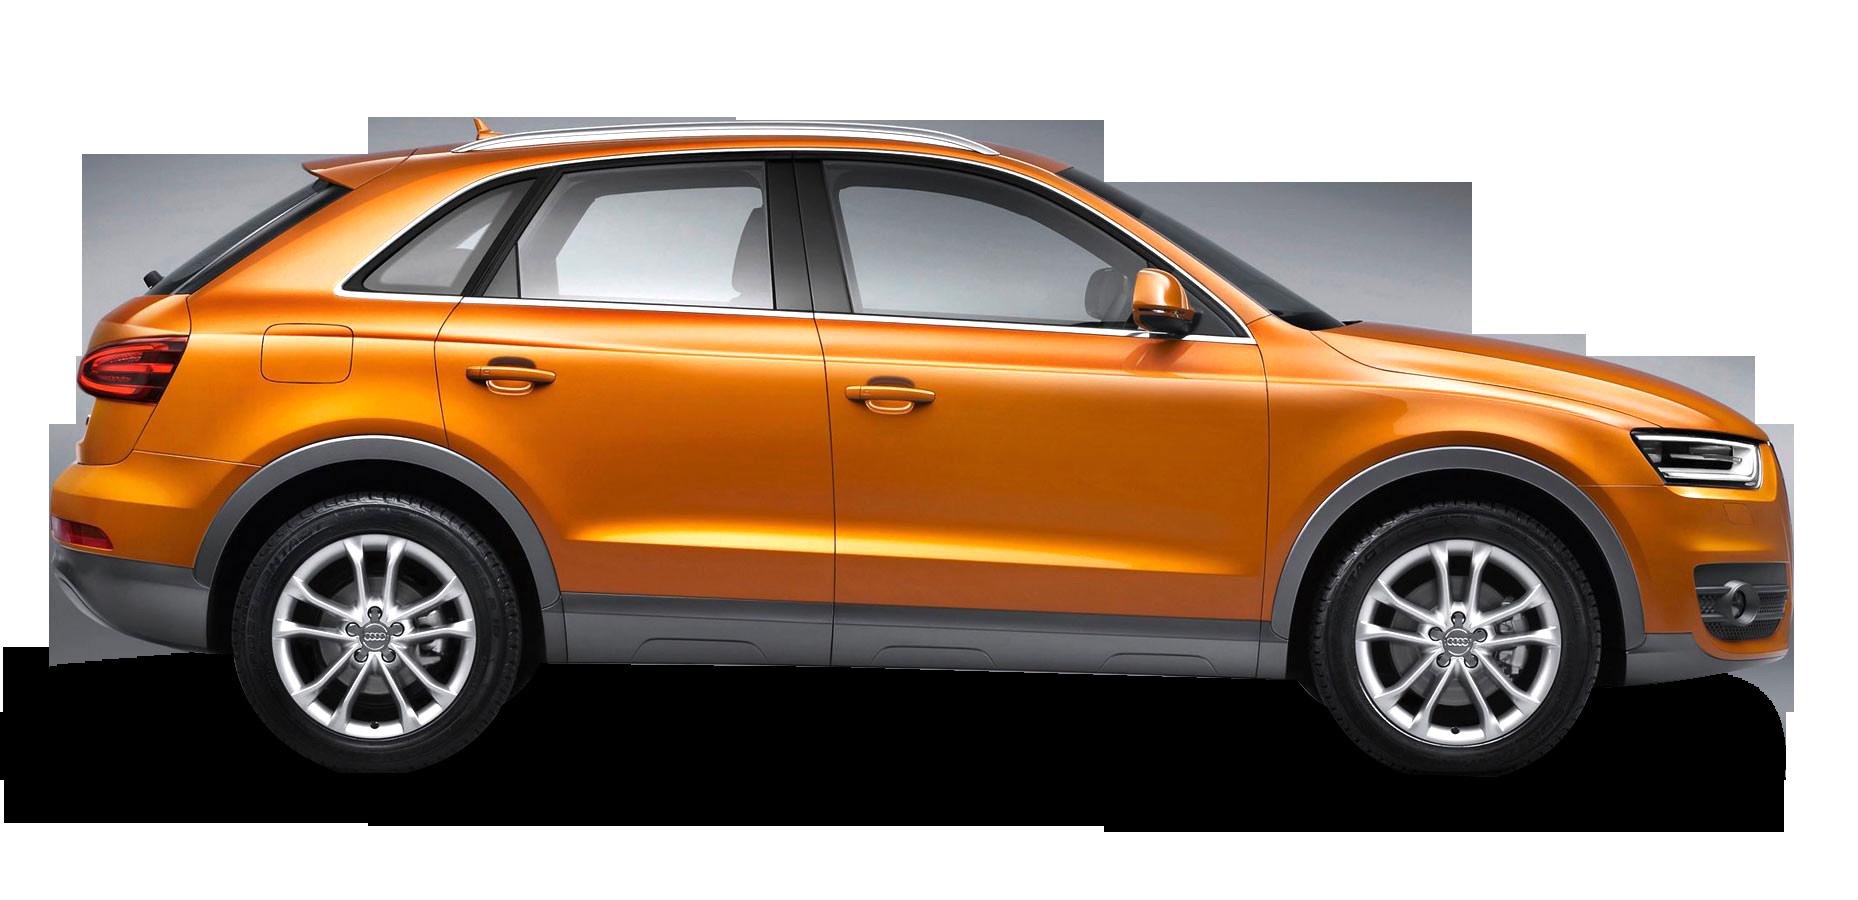 Audi Q3 Car PNG Orange Side view